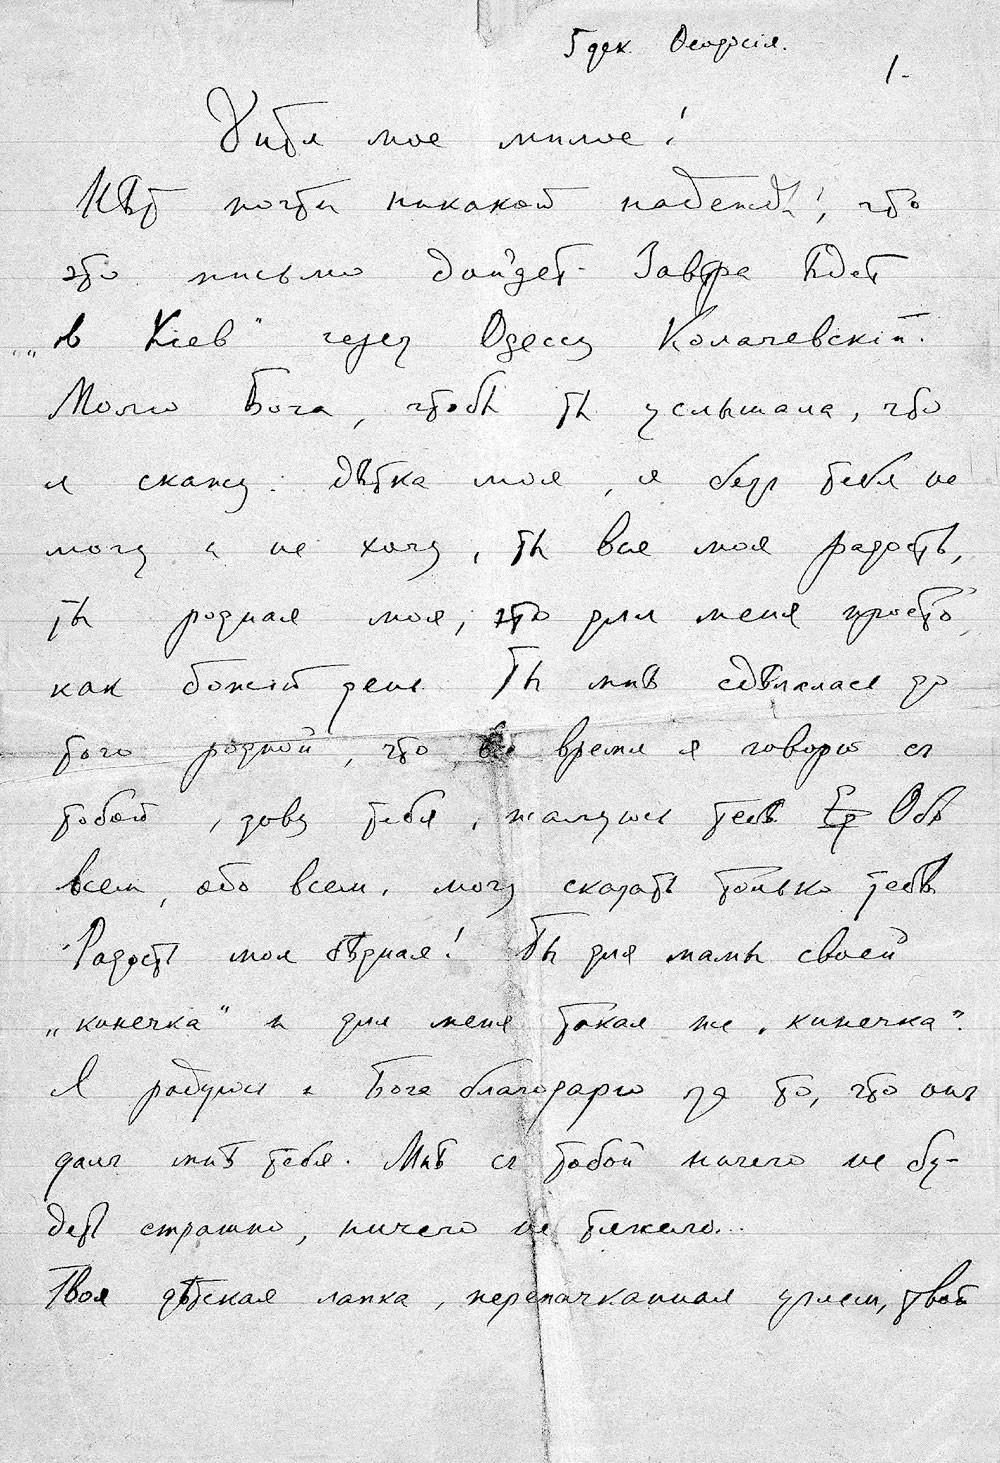 Una lettera di Osip Mandelshtam a Nadezhda, 5 dicembre 1919